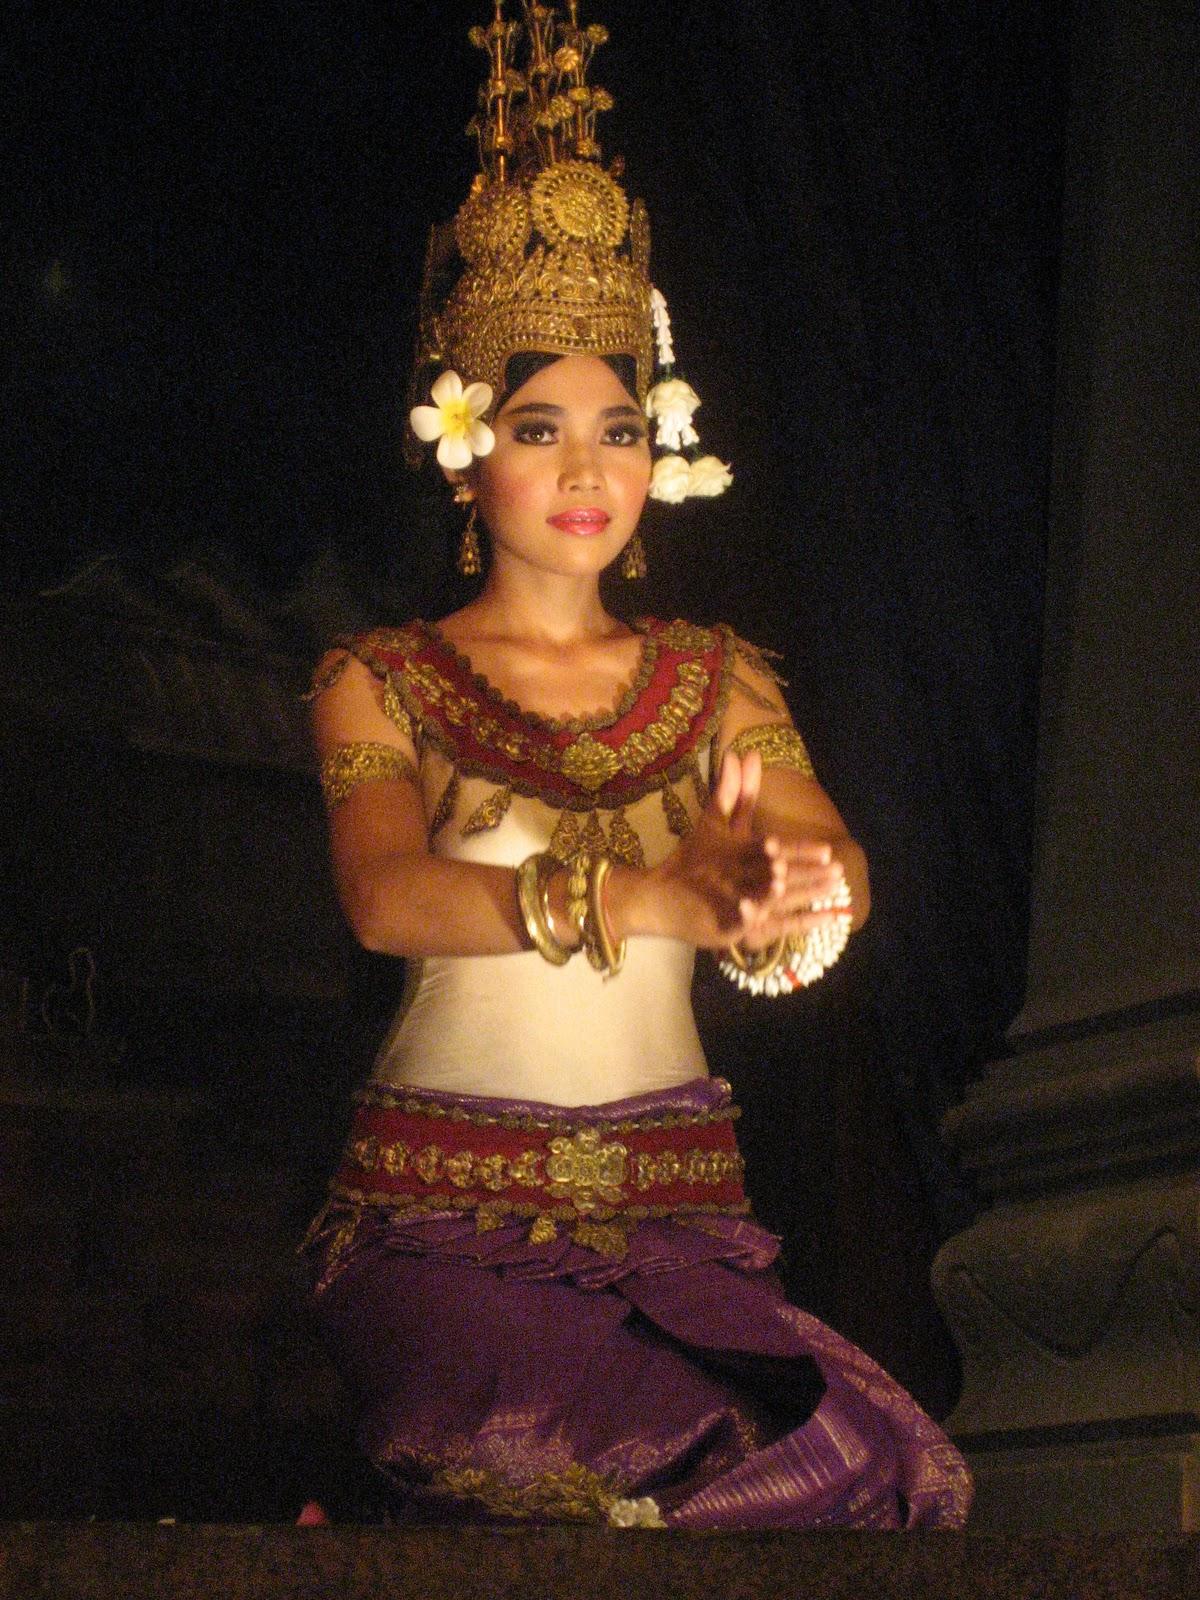 Dancer at Angkor Wat, Siem Reap Cambodia